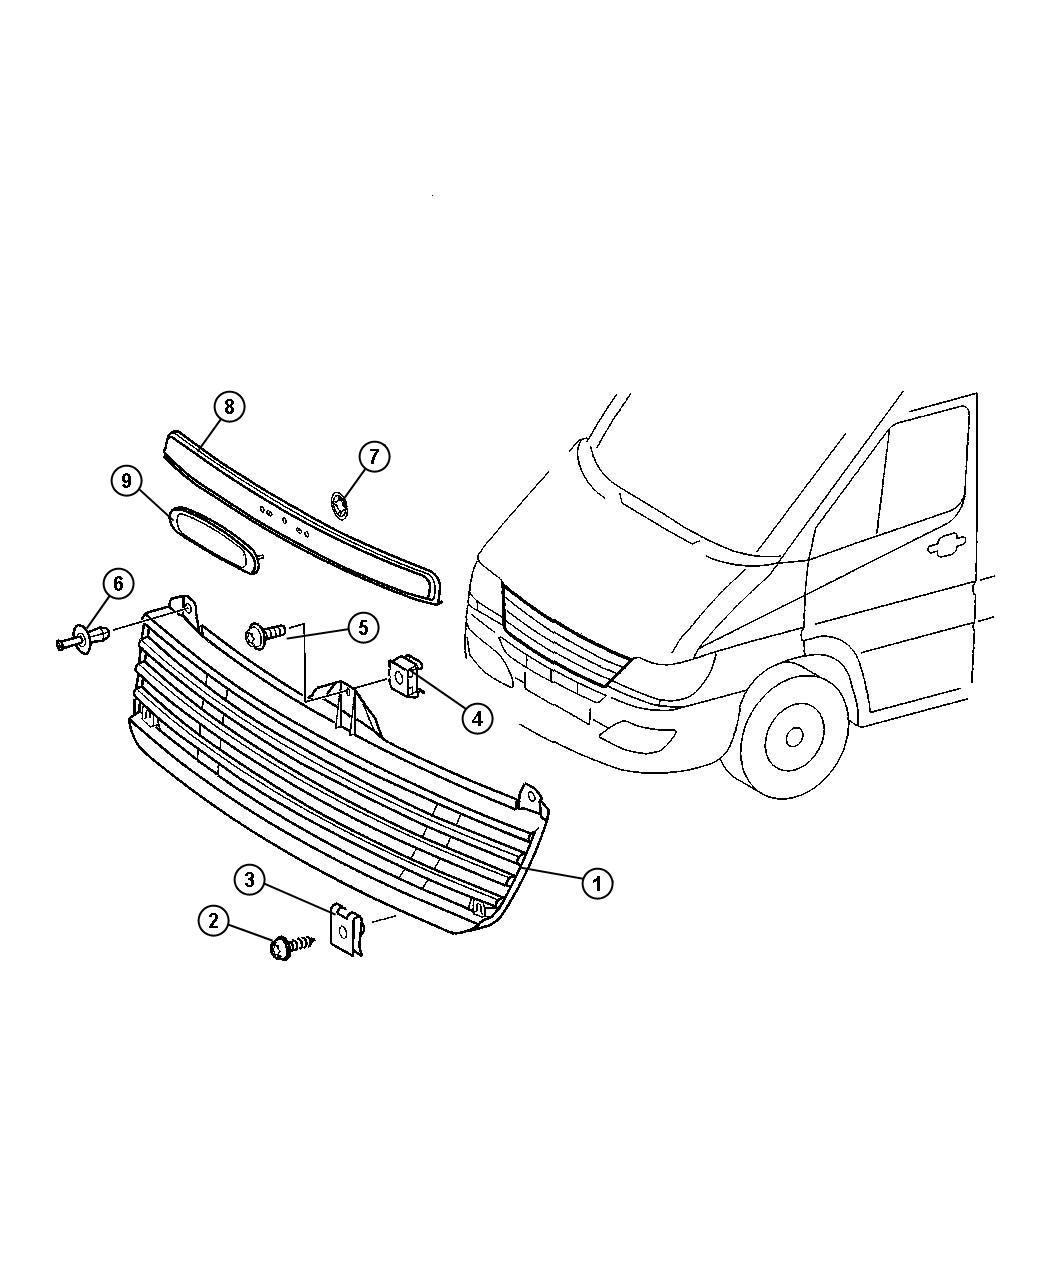 Dodge Sprinter Screw Dodge Badge With Rear